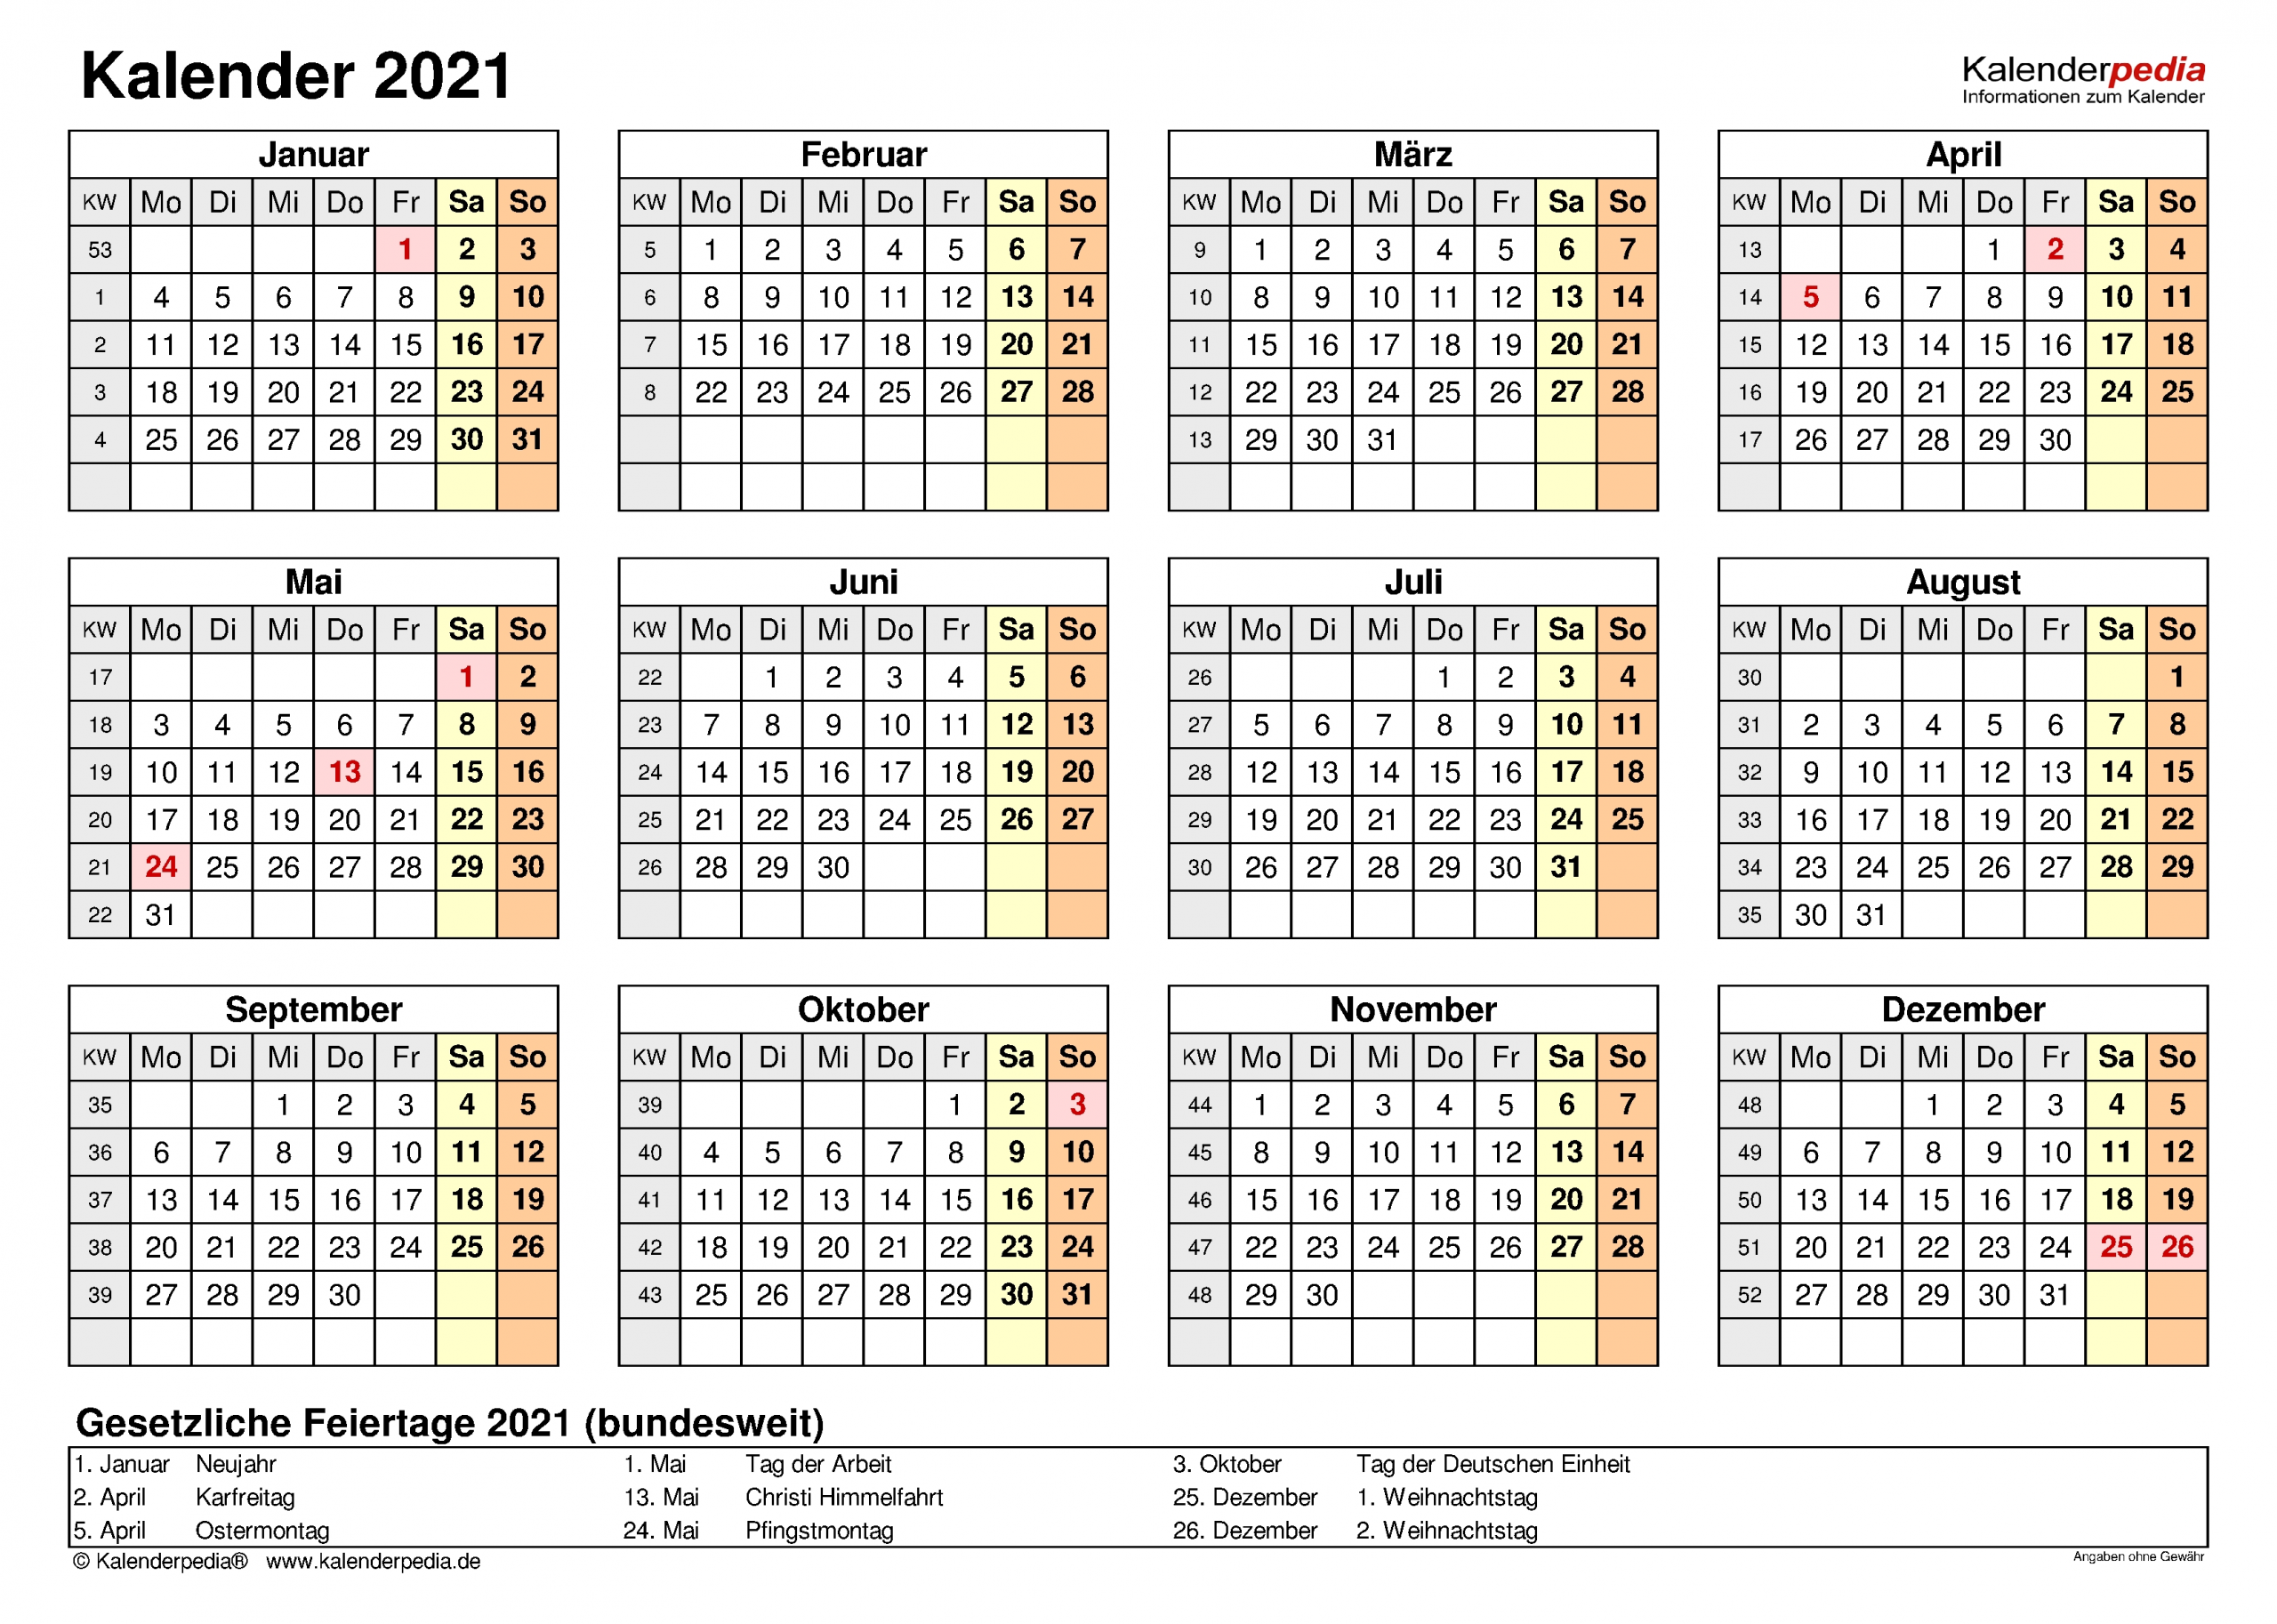 Get Jahreskalender 2021 Gross